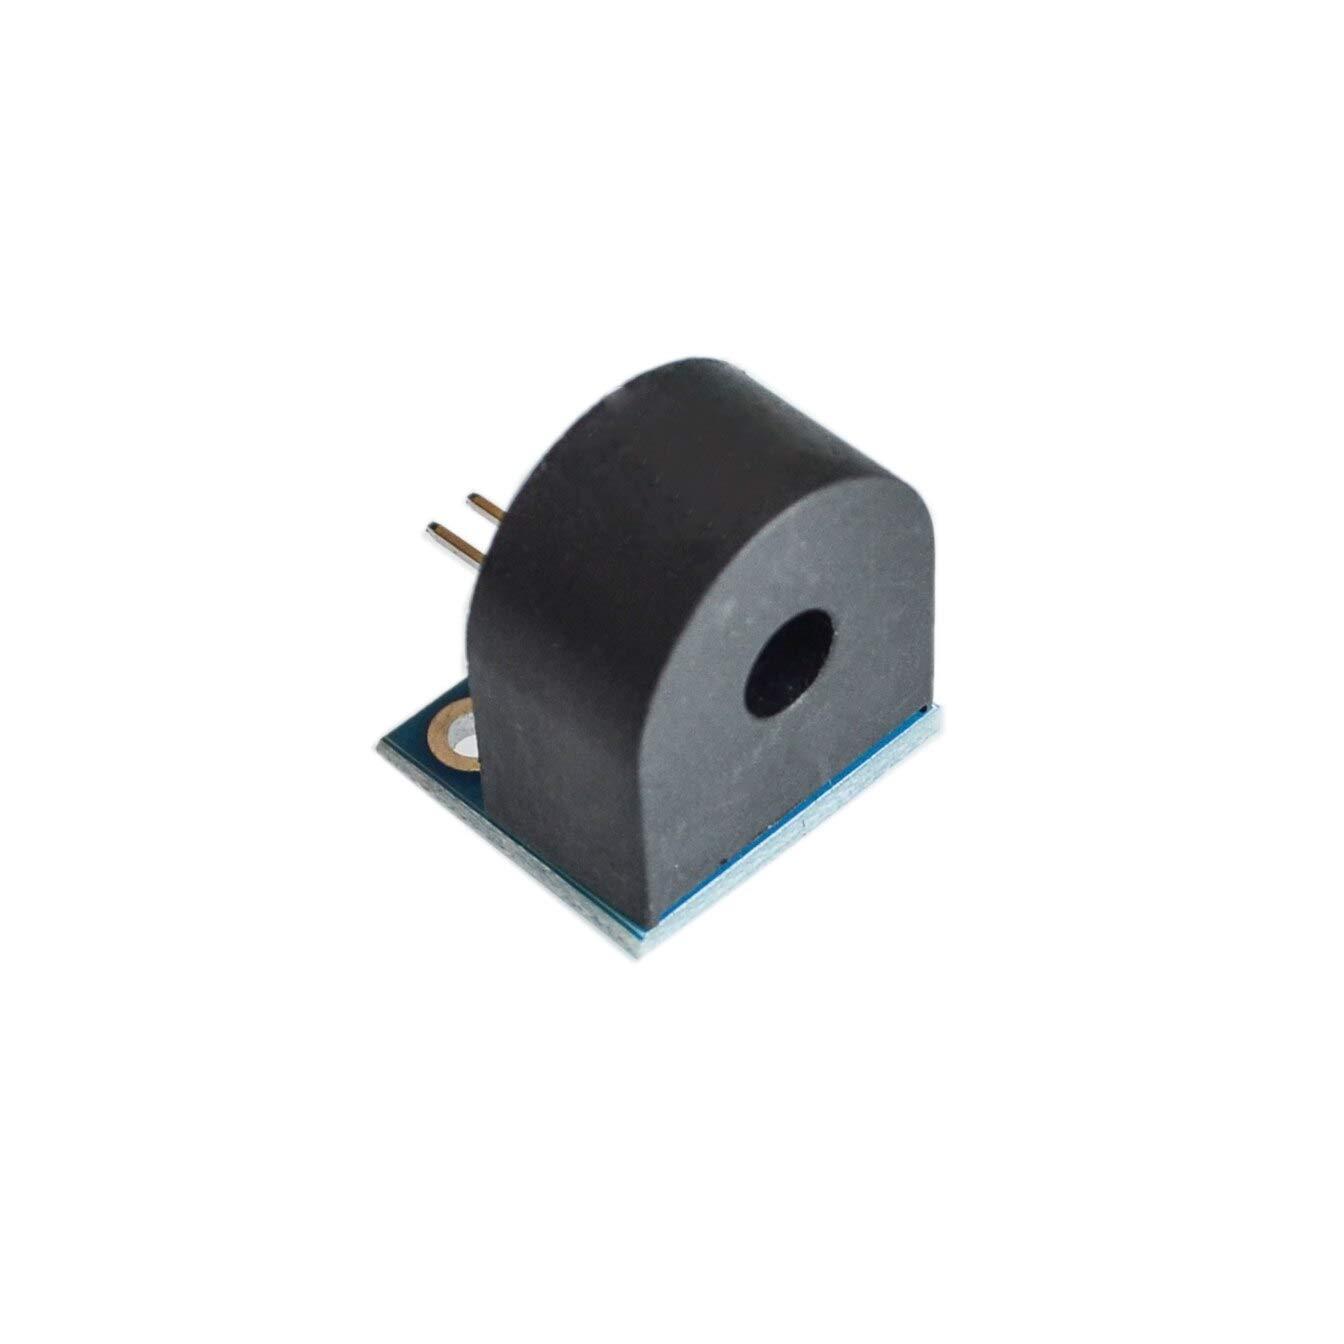 5A Range of Single-Phase AC Current Sensor Module for Arduino